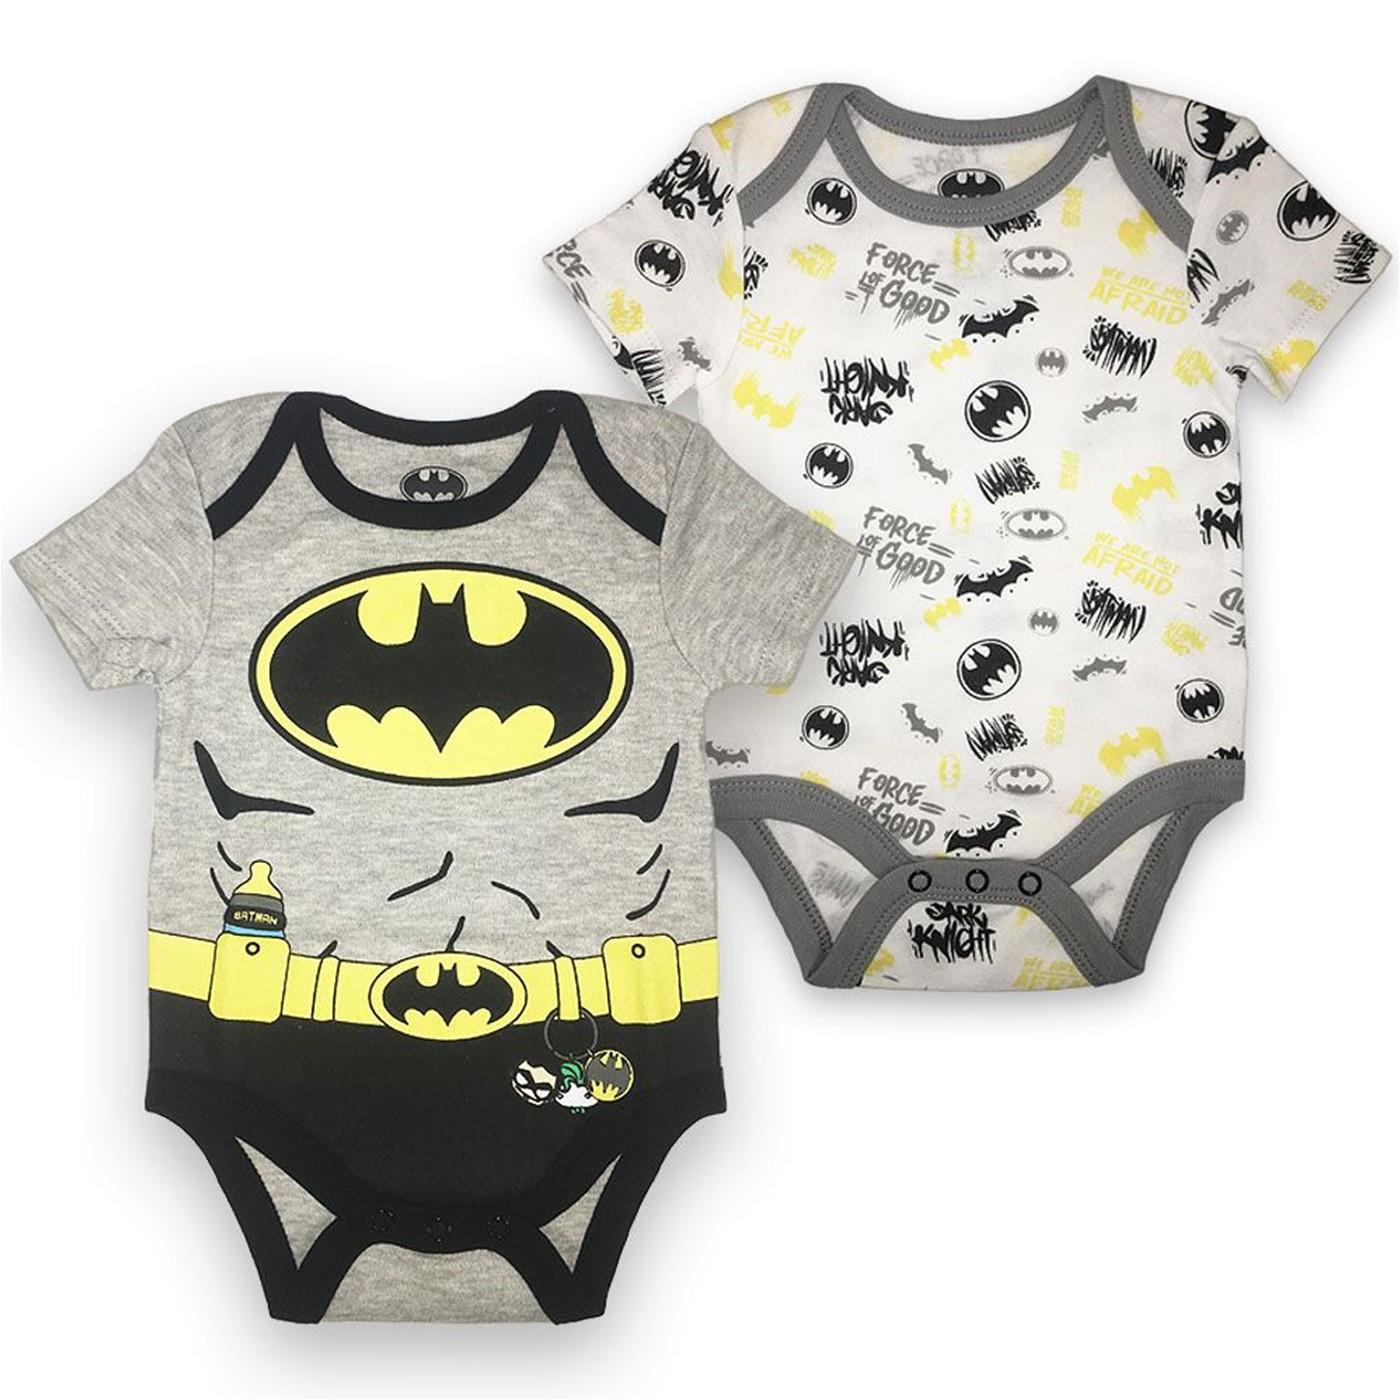 Batman Costume and Symbols 2-Pack Infant Bodysuit Set